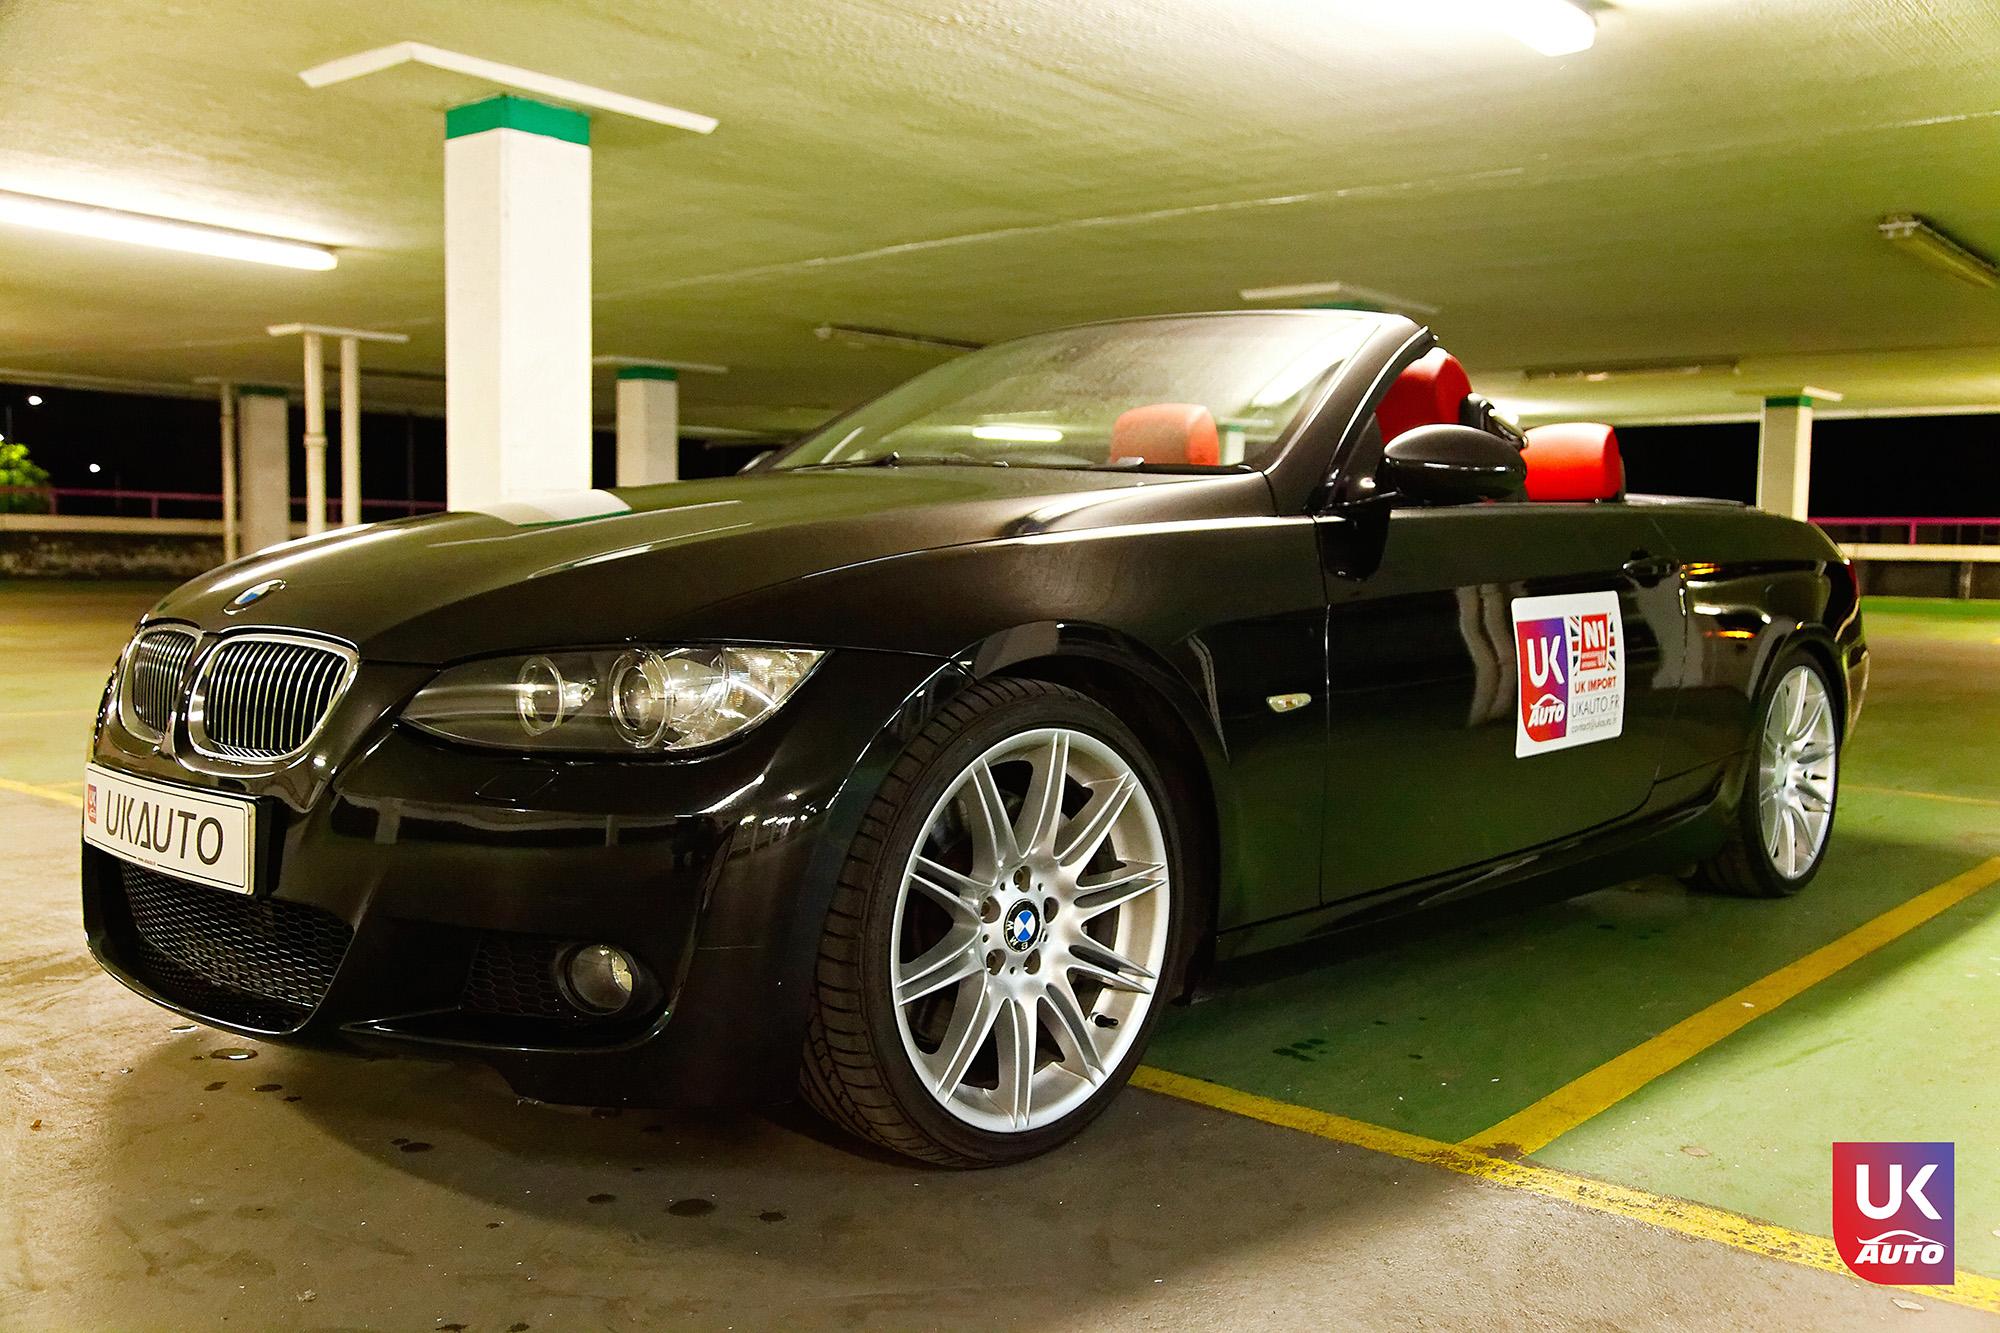 UKAUTO IMPORT ANGLETERRE BMW 335i CABRIOLET UKA RHD9 - Felecitation a Jeremie pour cette BMW 335i cabriolet RHD PACK M IMPORT AUTO ANGLAISE